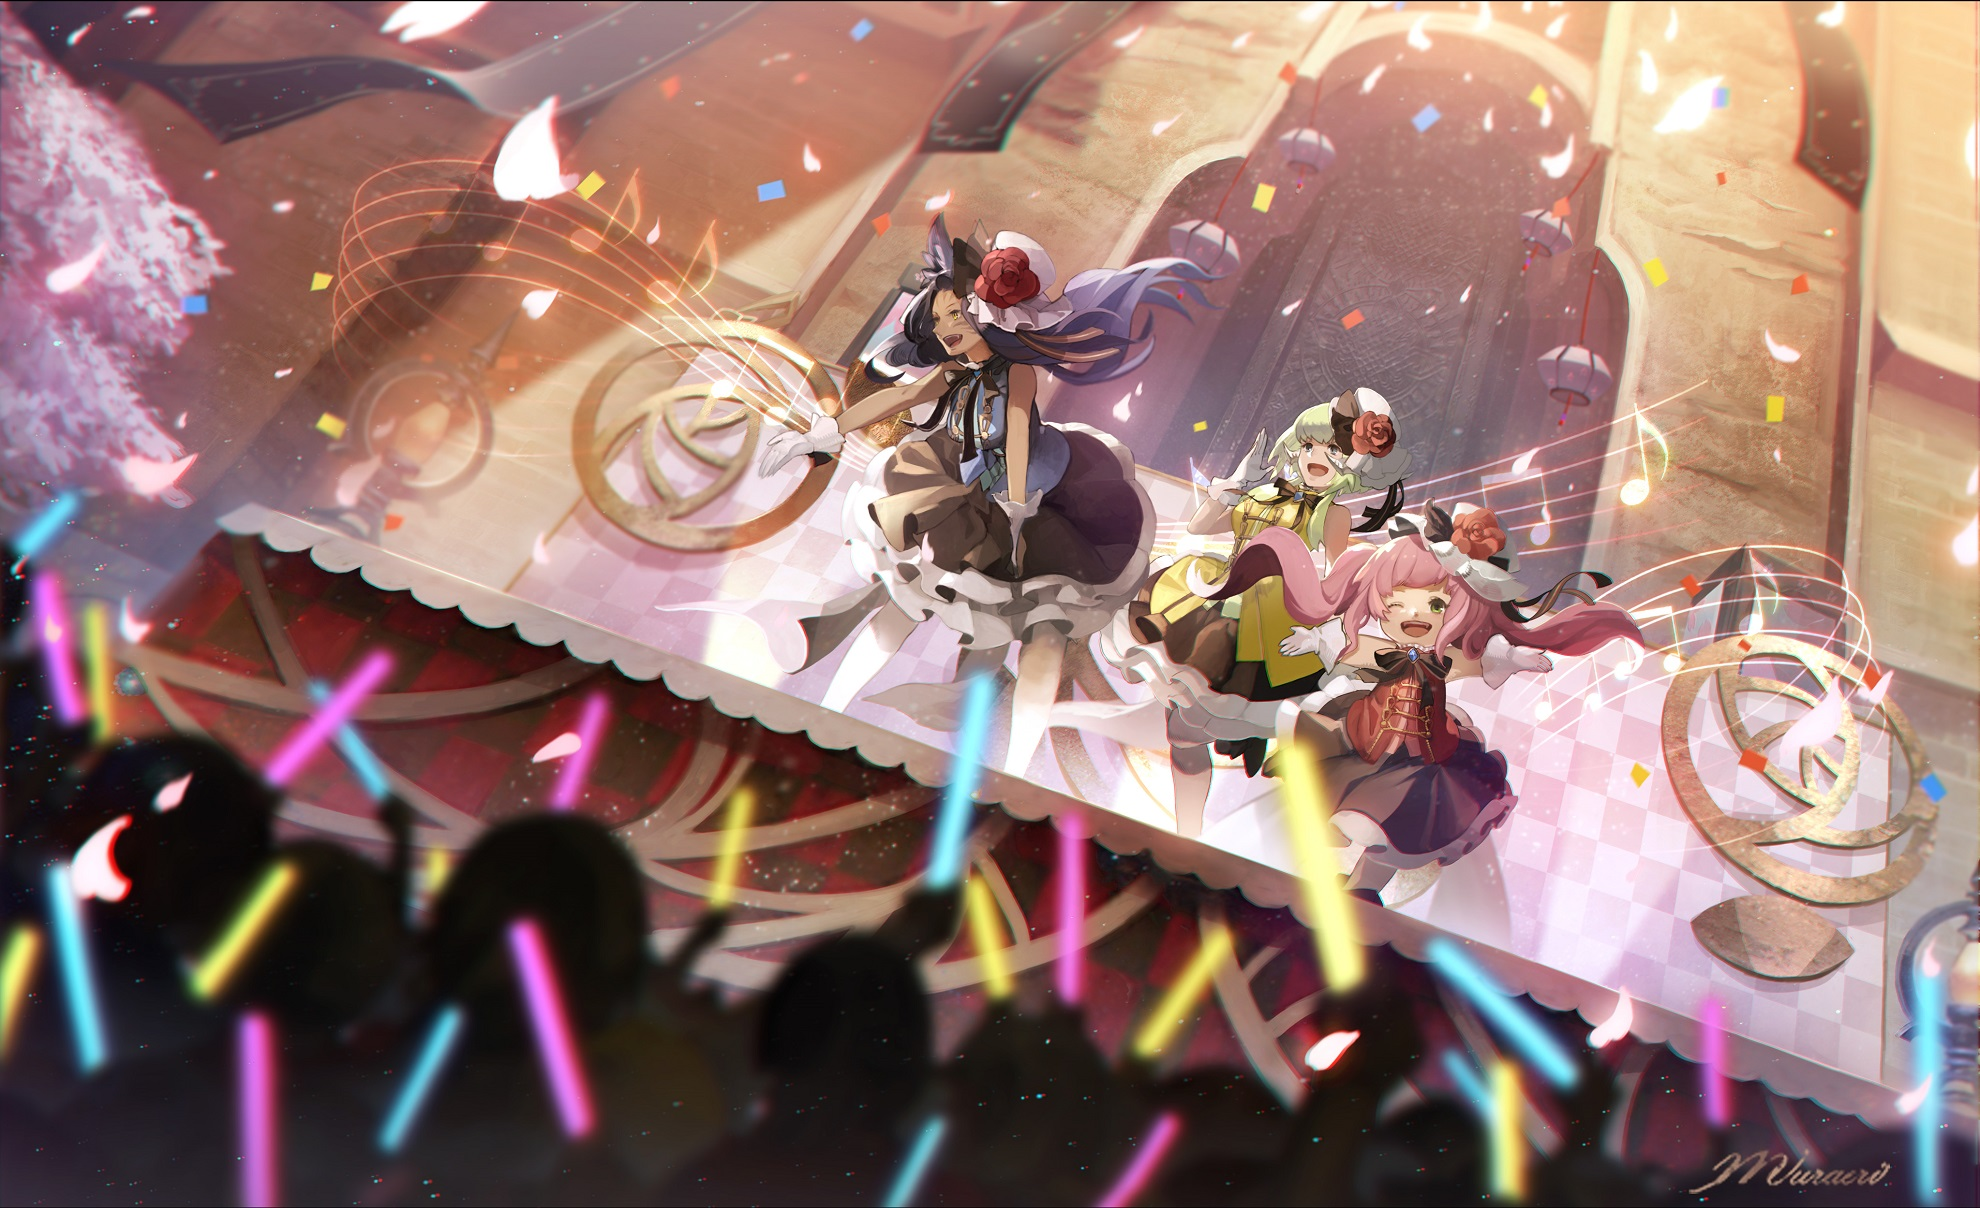 Final fantasy XIV: Stormblood - Little Ladies Day